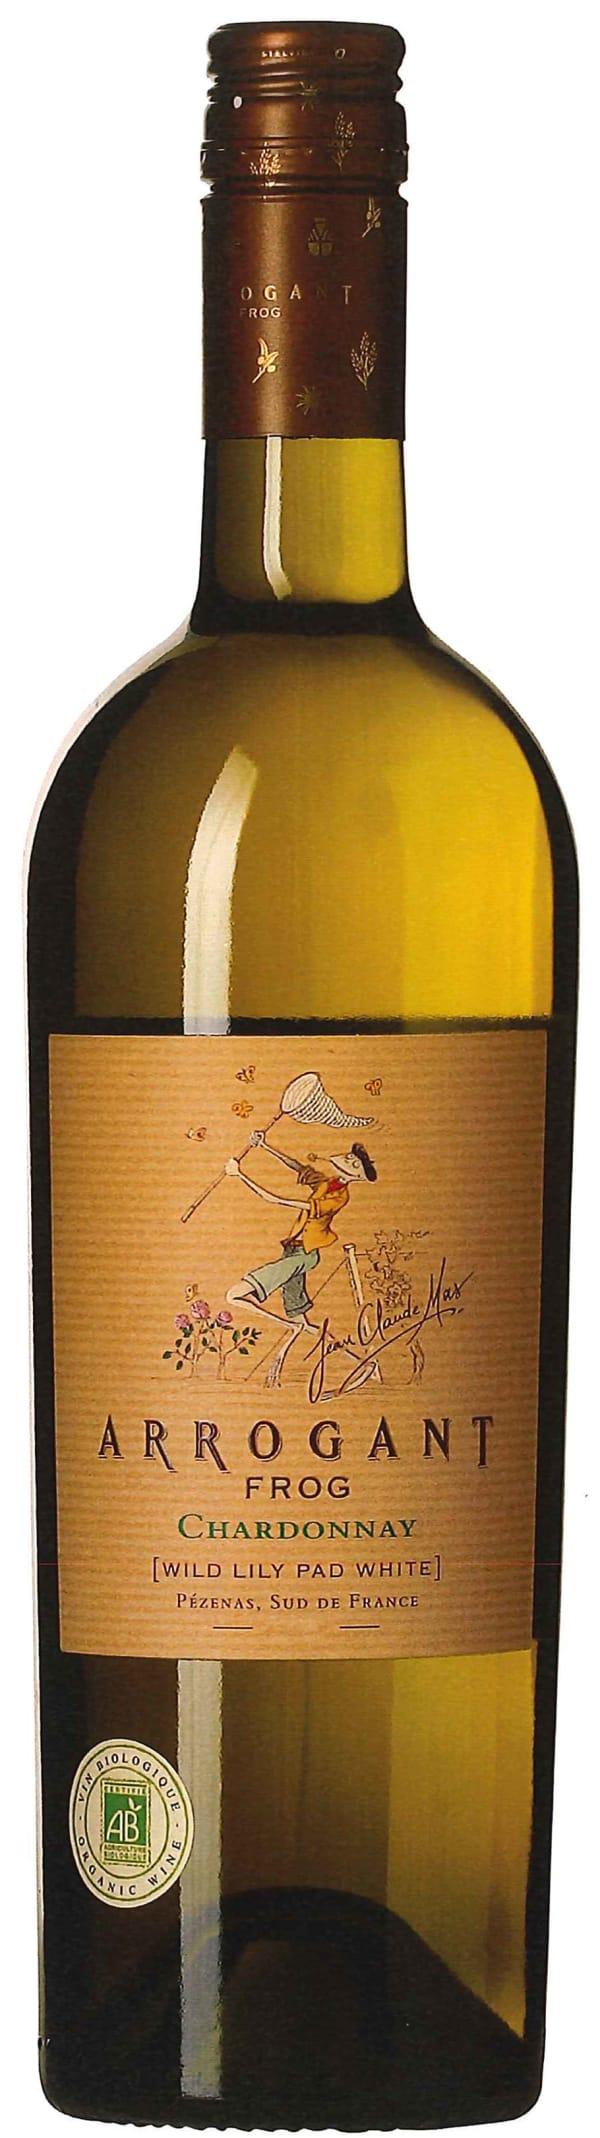 Arrogant Frog Chardonnay 2017